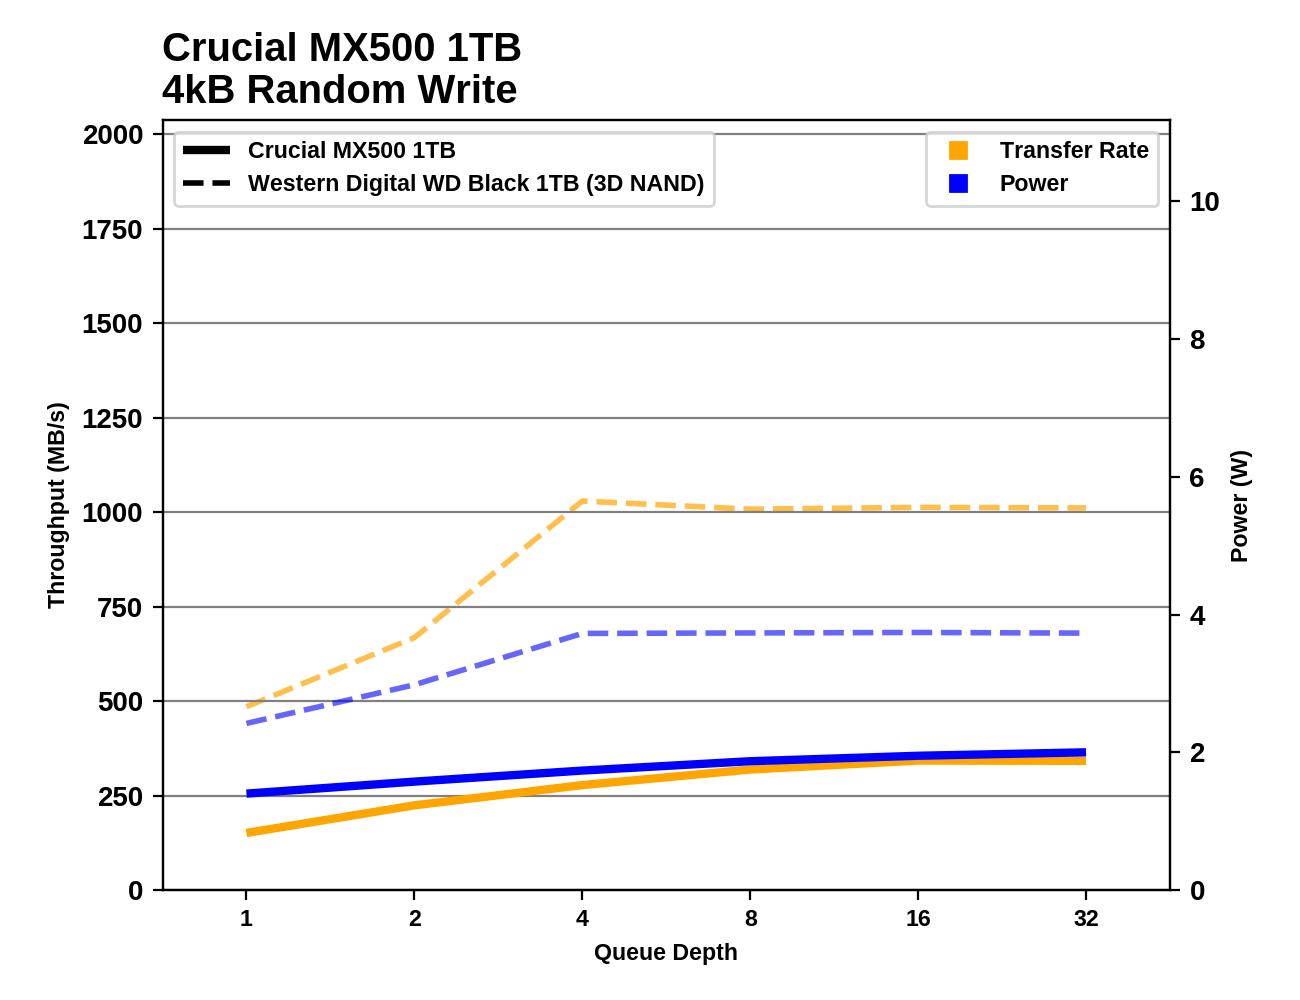 Обзор Western Digital WD Black 3D NAND SSD: EVO встретил равного - 69